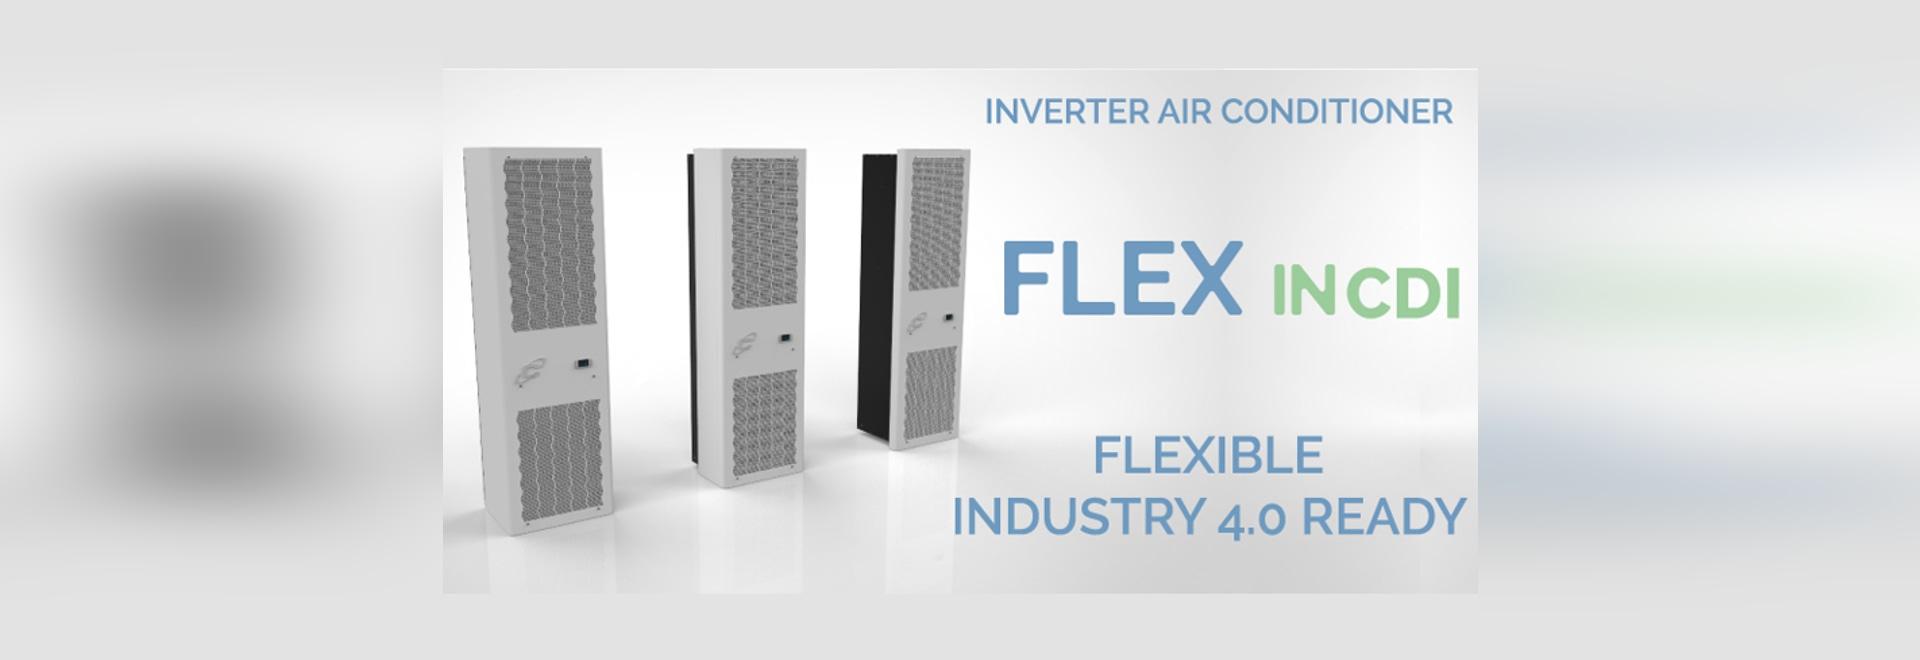 FlexIn CDI